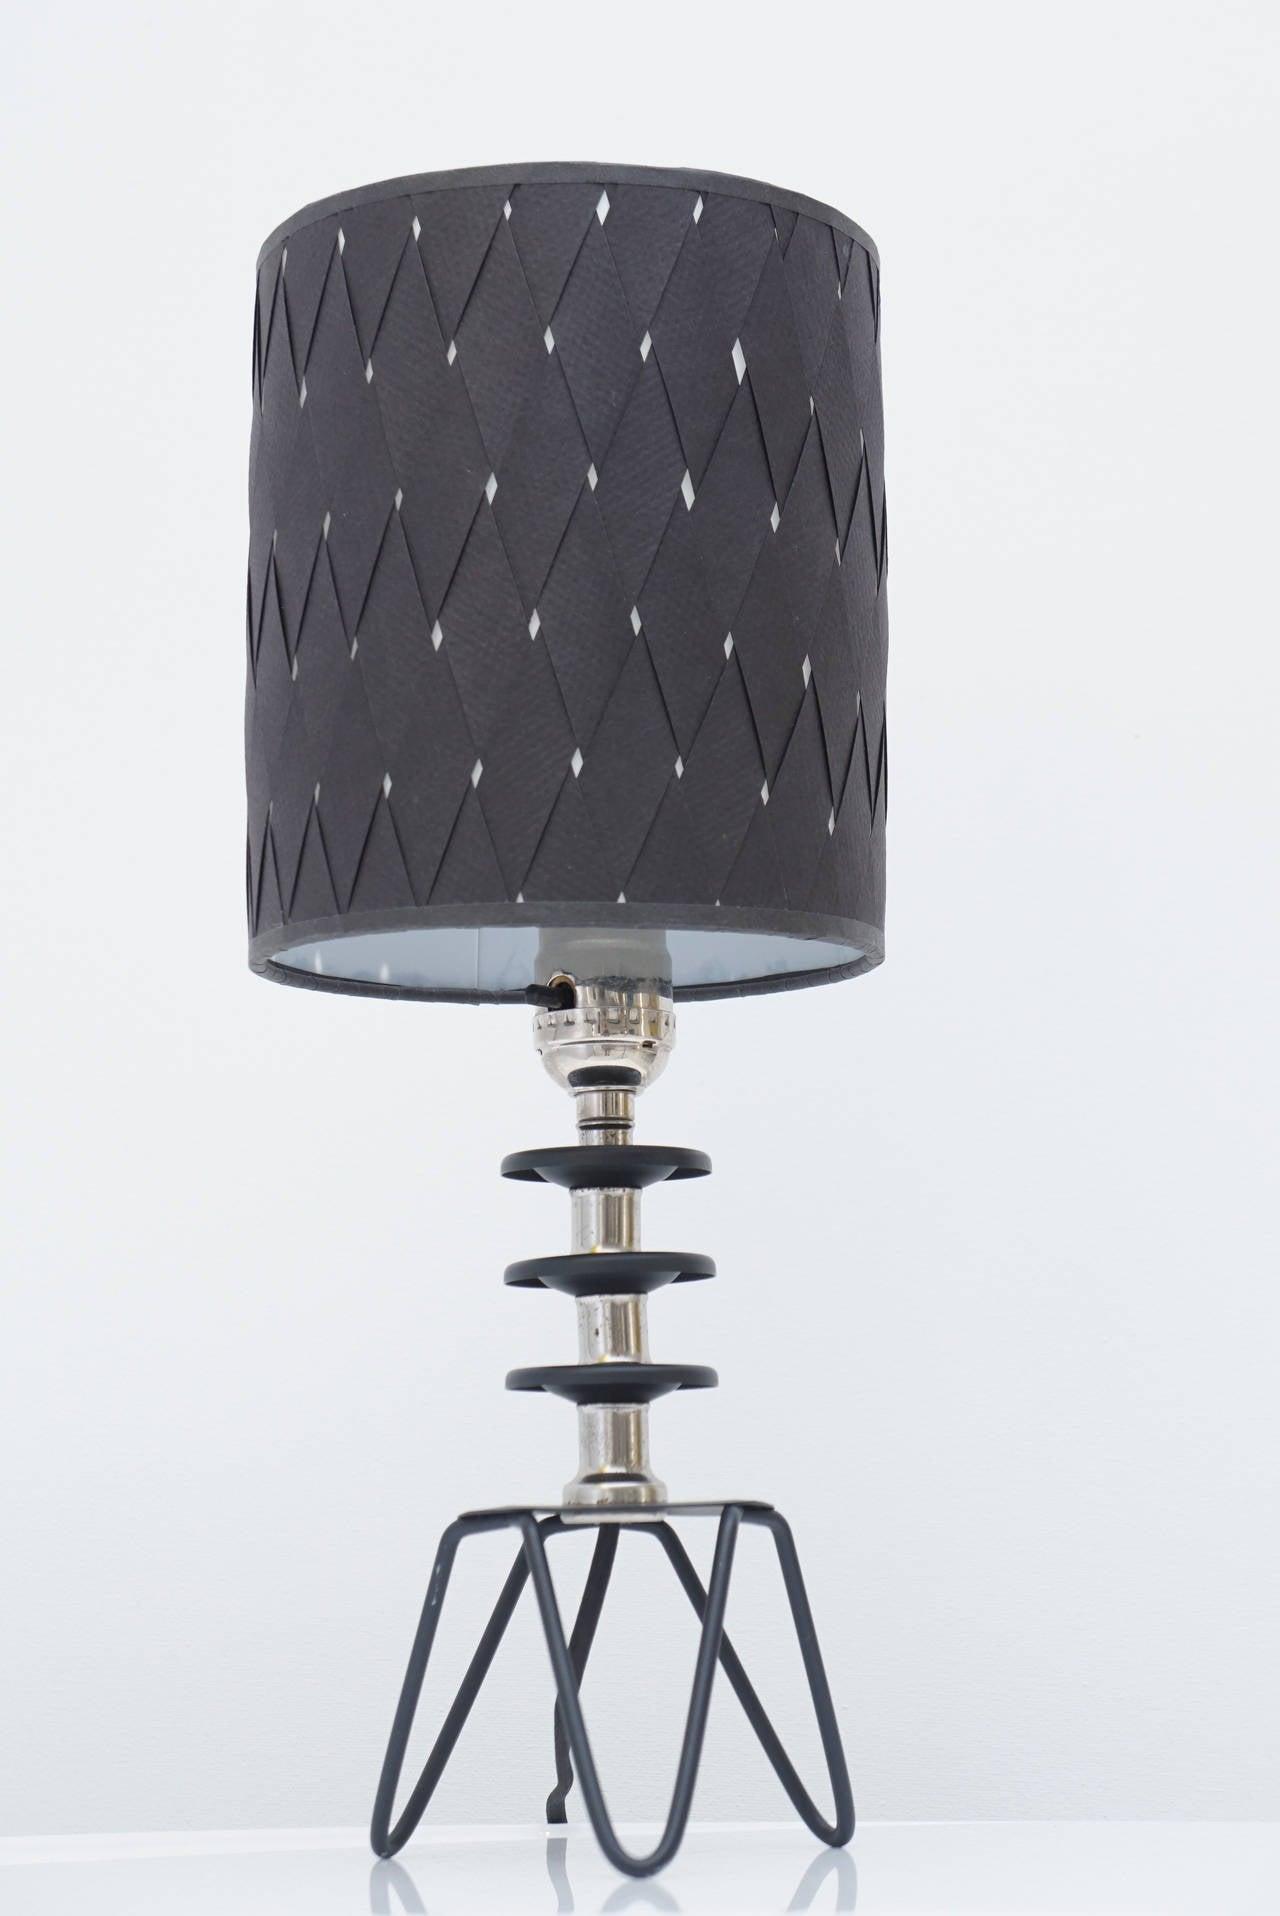 vintage miniature deco table lamp for sale at 1stdibs. Black Bedroom Furniture Sets. Home Design Ideas